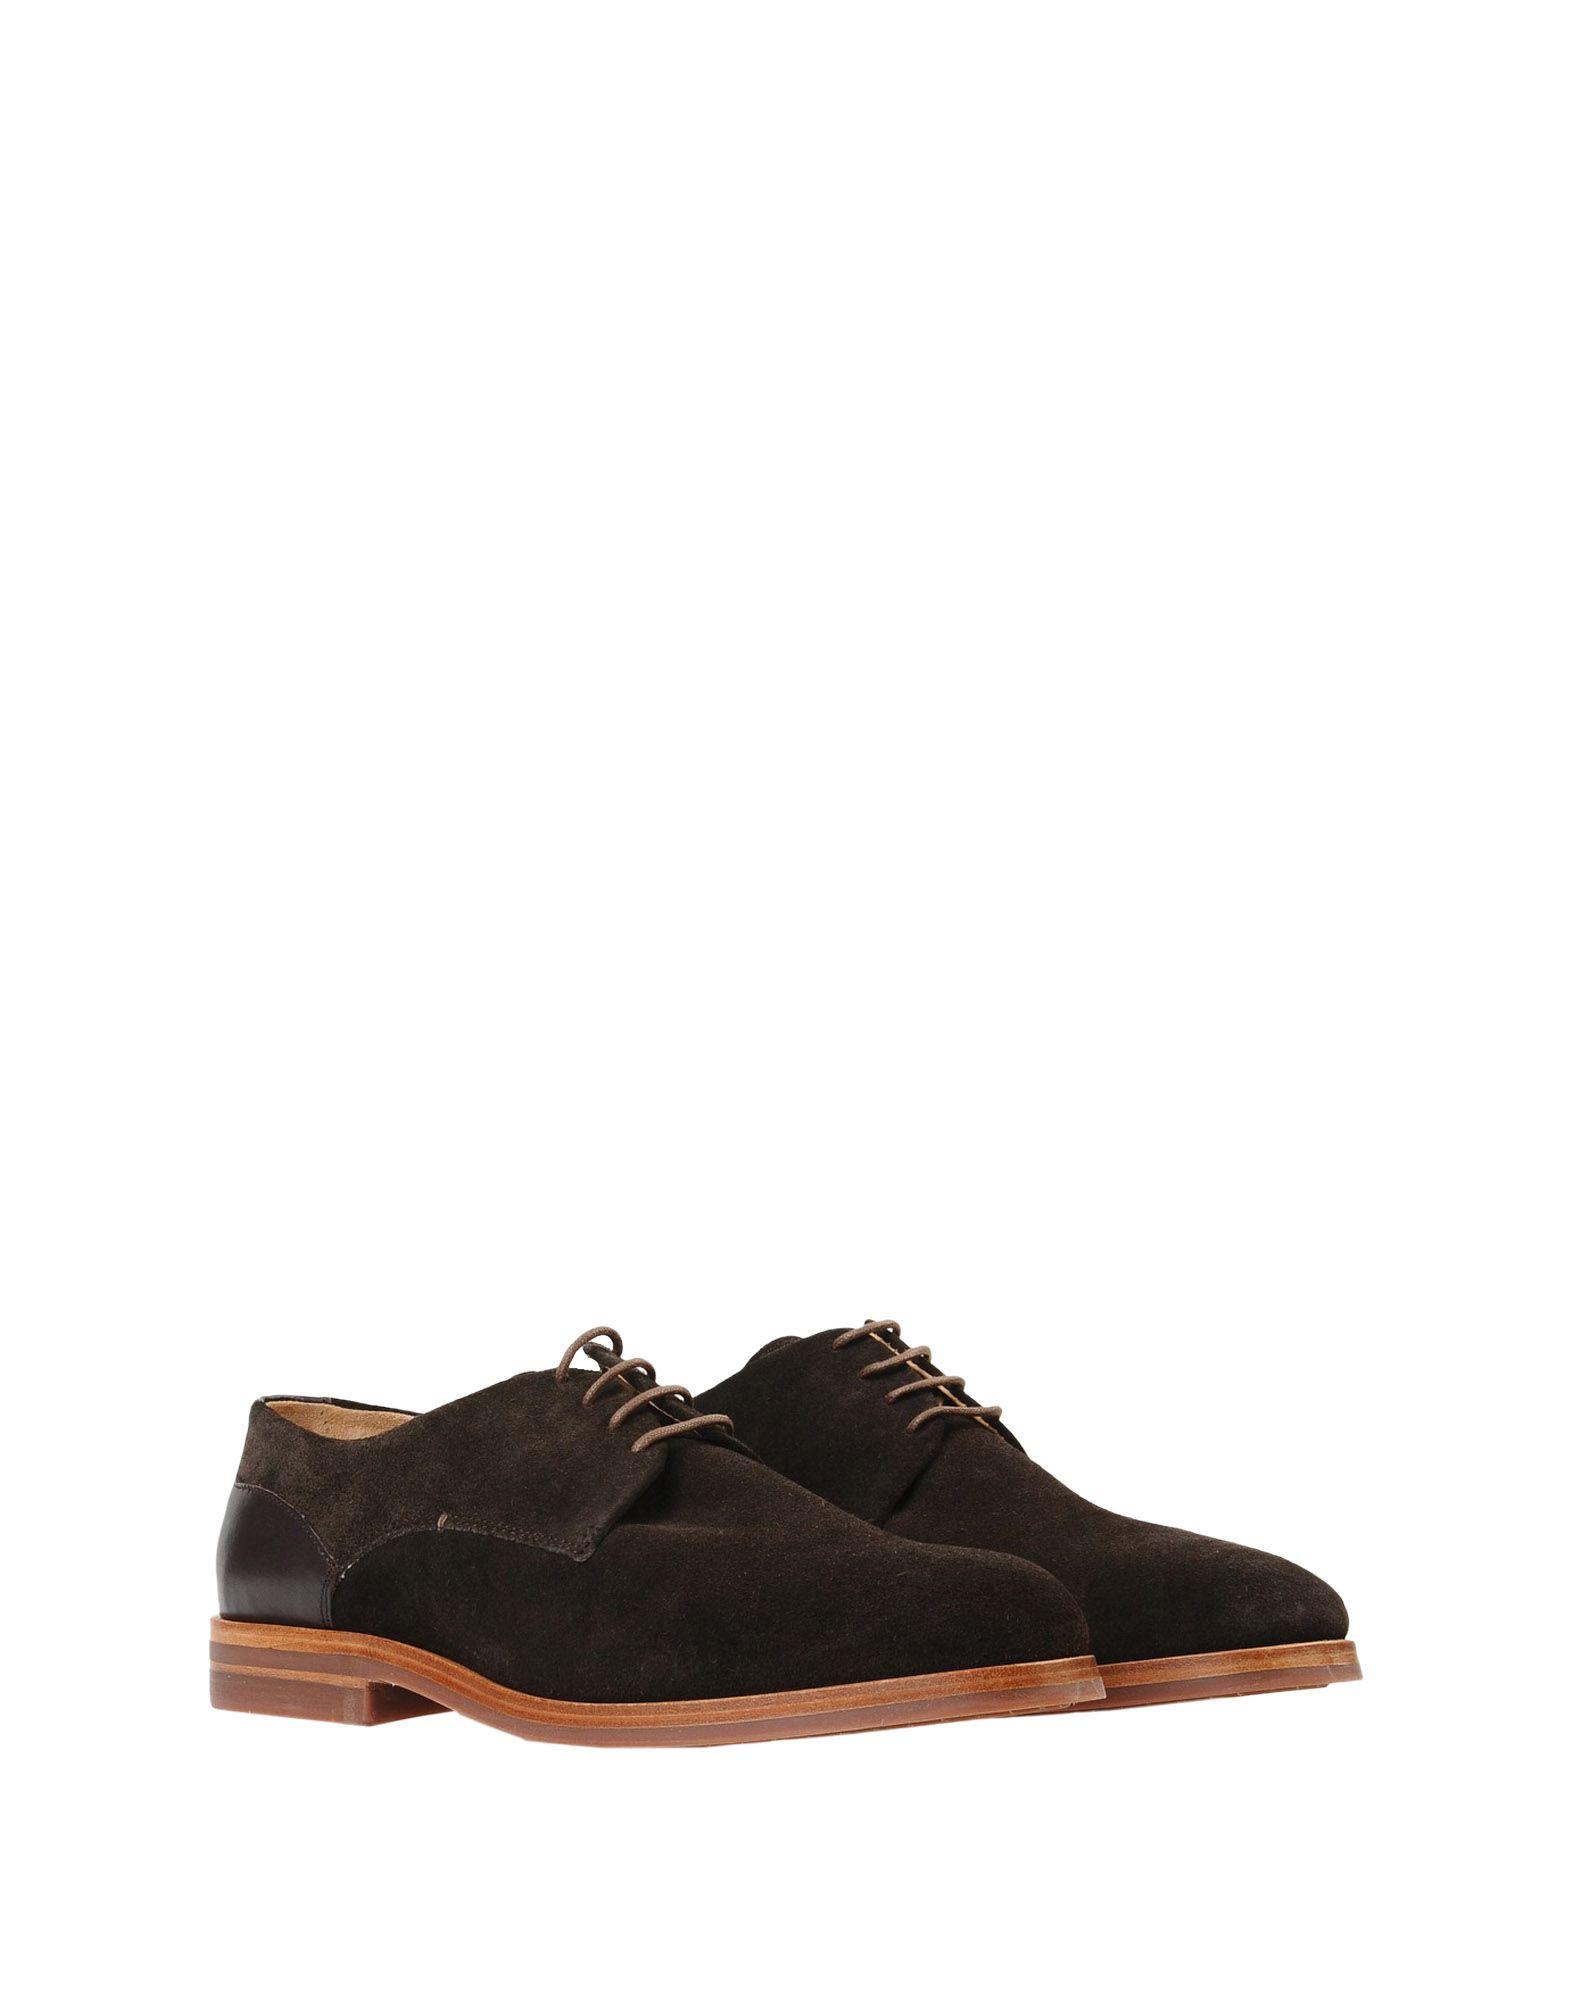 H By Hudson Enrico    11458131PN Neue Schuhe 8f49be